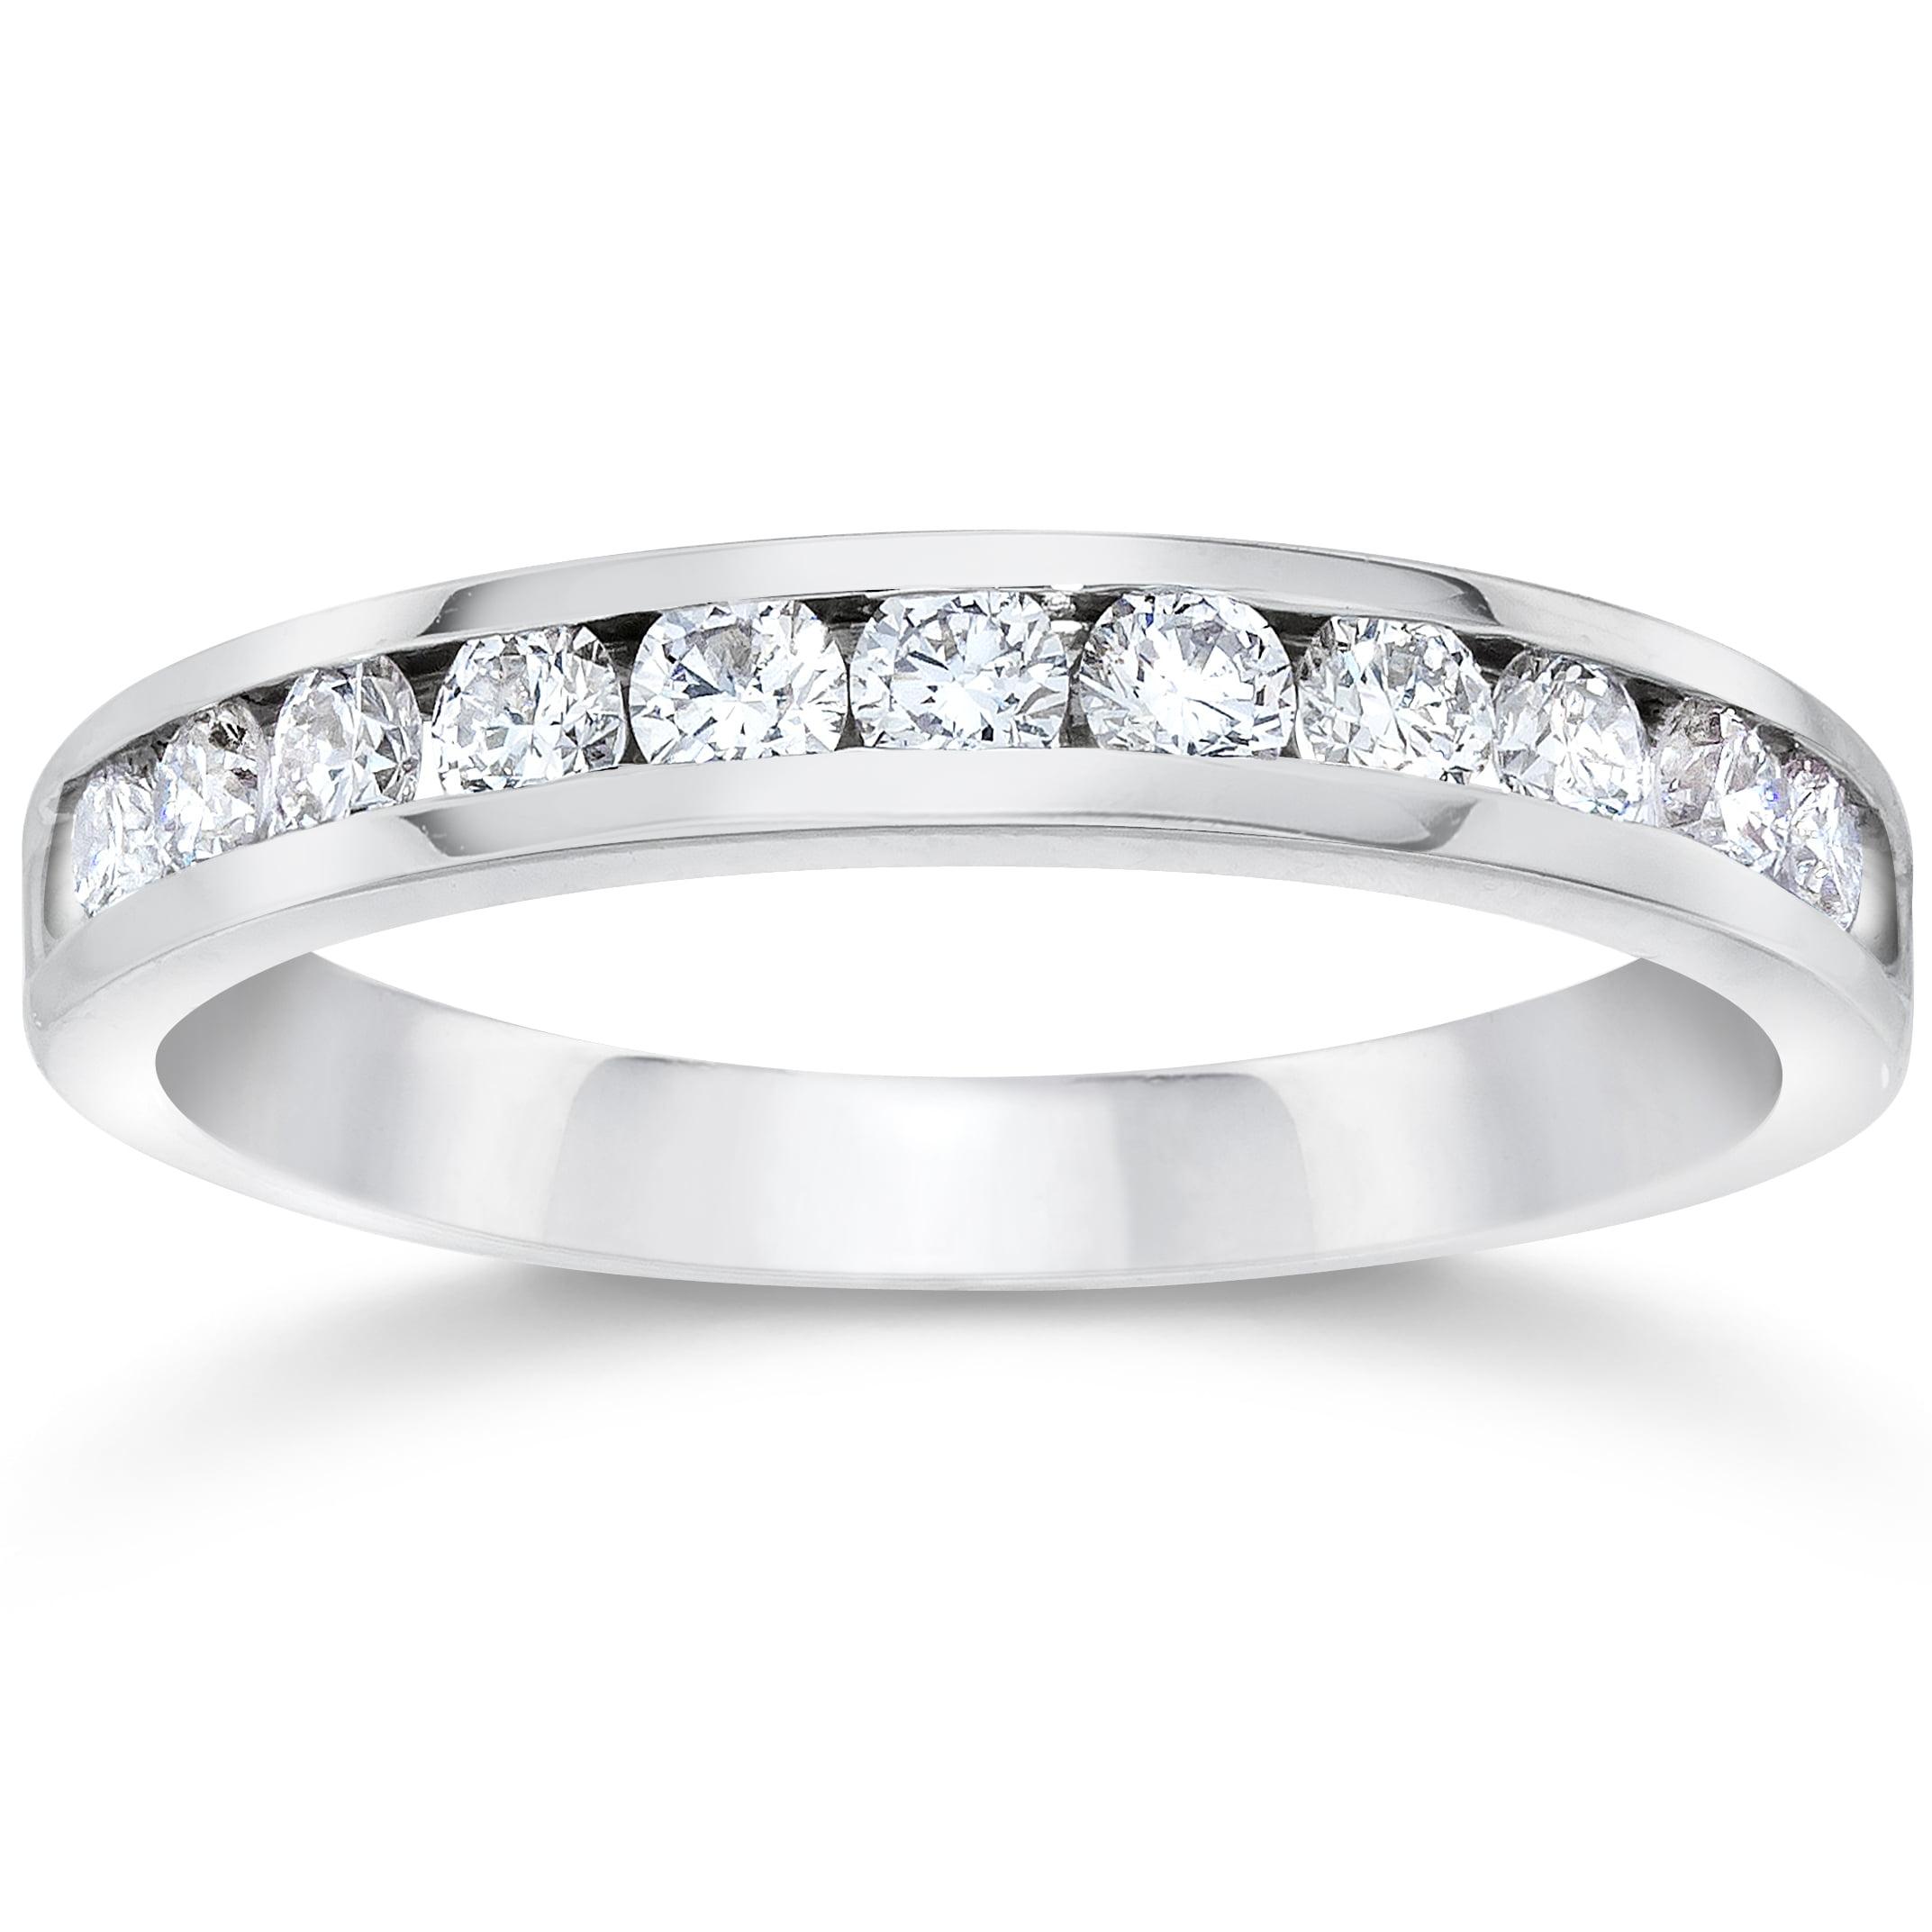 950 Platinum Channel Set Diamond 1 2ct Wedding Ring by Pompeii3